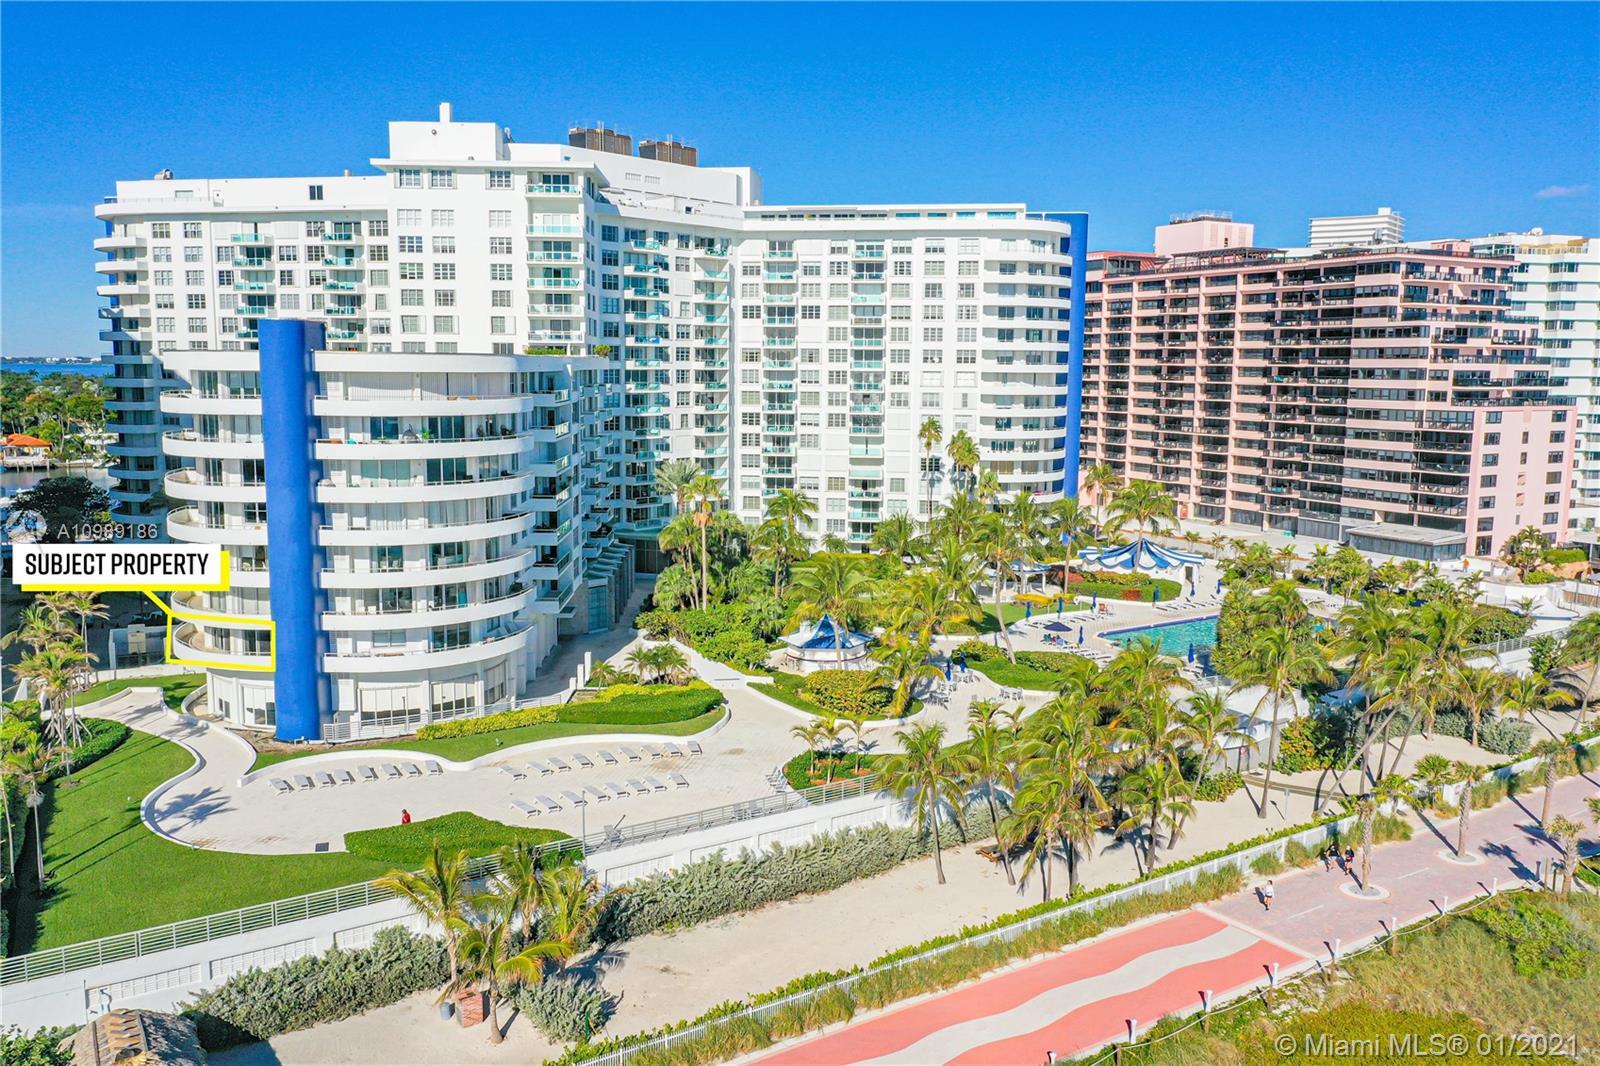 Seacoast 5151 #431/430 - 5151 COLLINS AV #431/430, Miami Beach, FL 33140